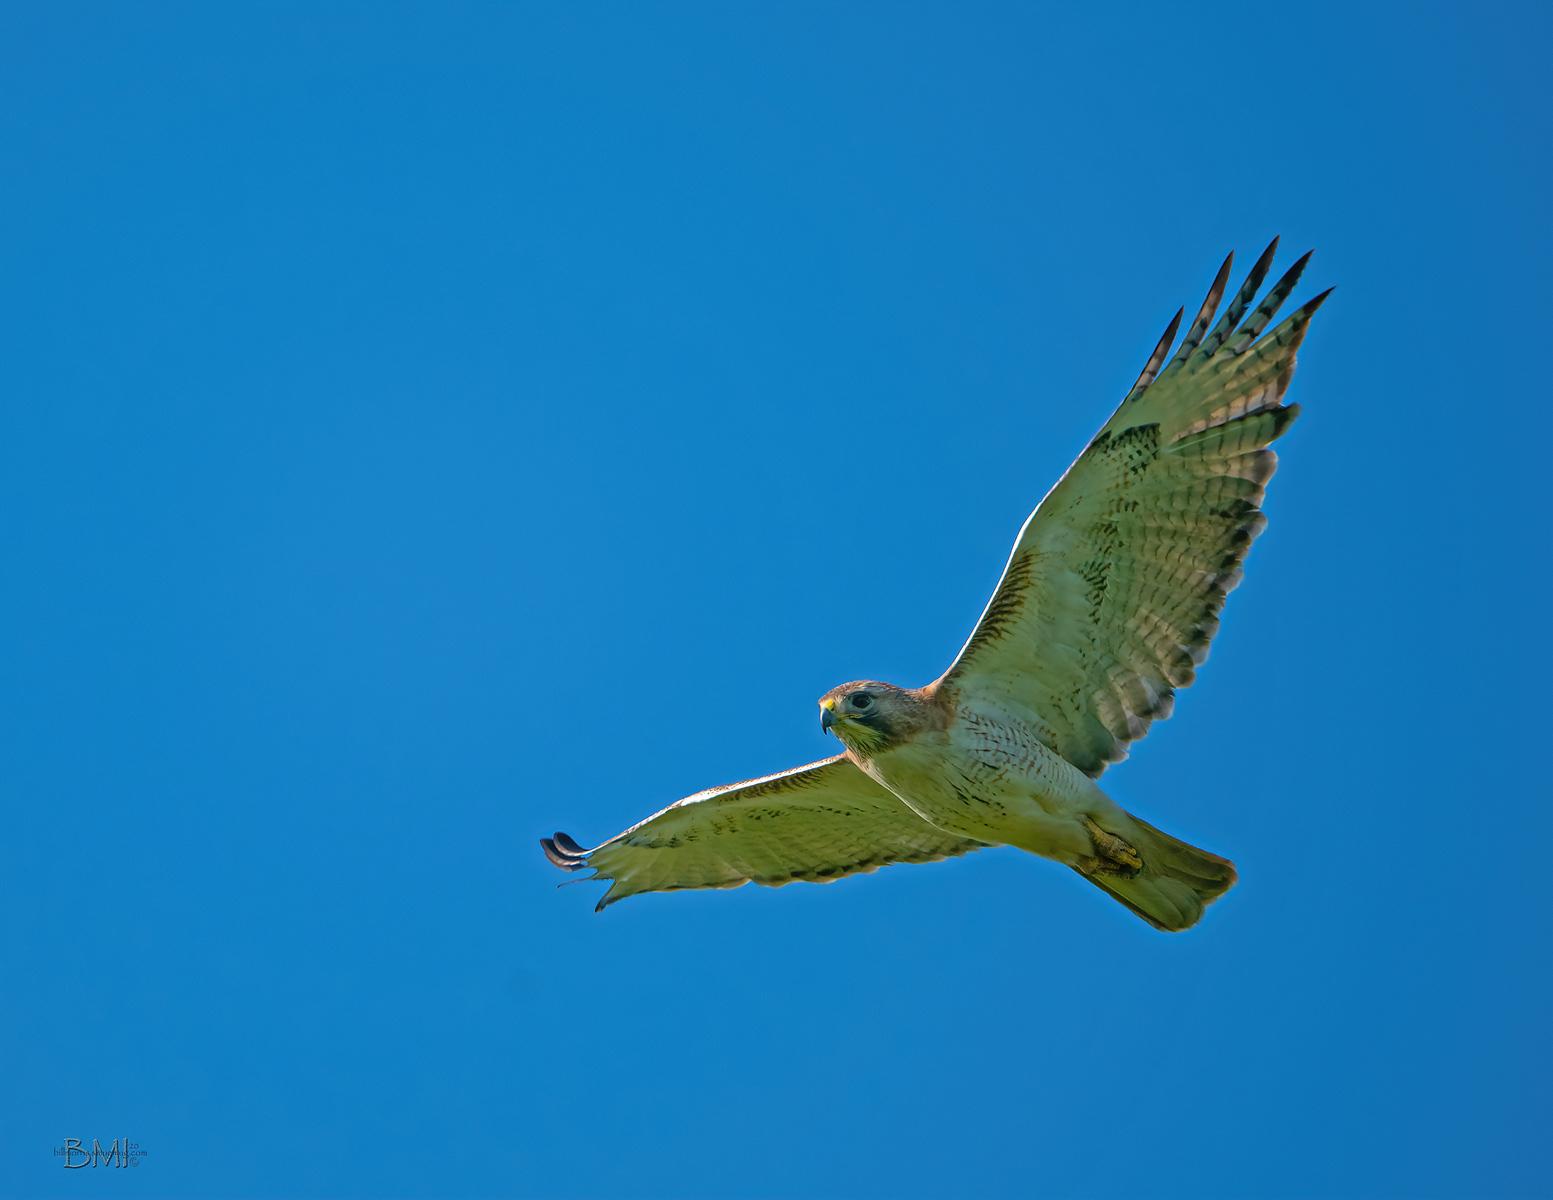 IMAGE: https://photos.smugmug.com/Beautyinthetreesandintheair/Raptors/i-9m99Q6b/0/d4e9f645/X3/Red-tailed%20hawk_9_4-12-2020-241-X3.jpg